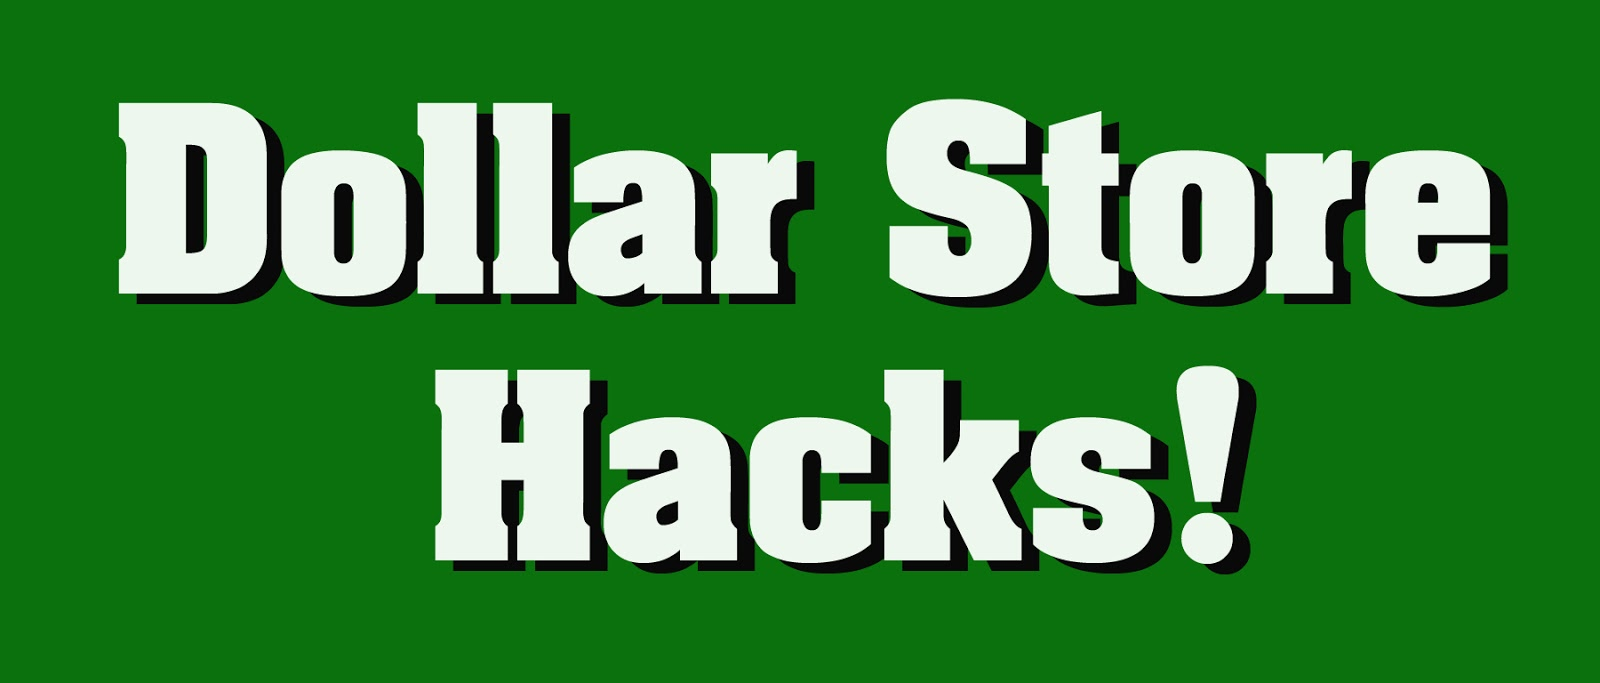 dollar store hacks silhouette cutting